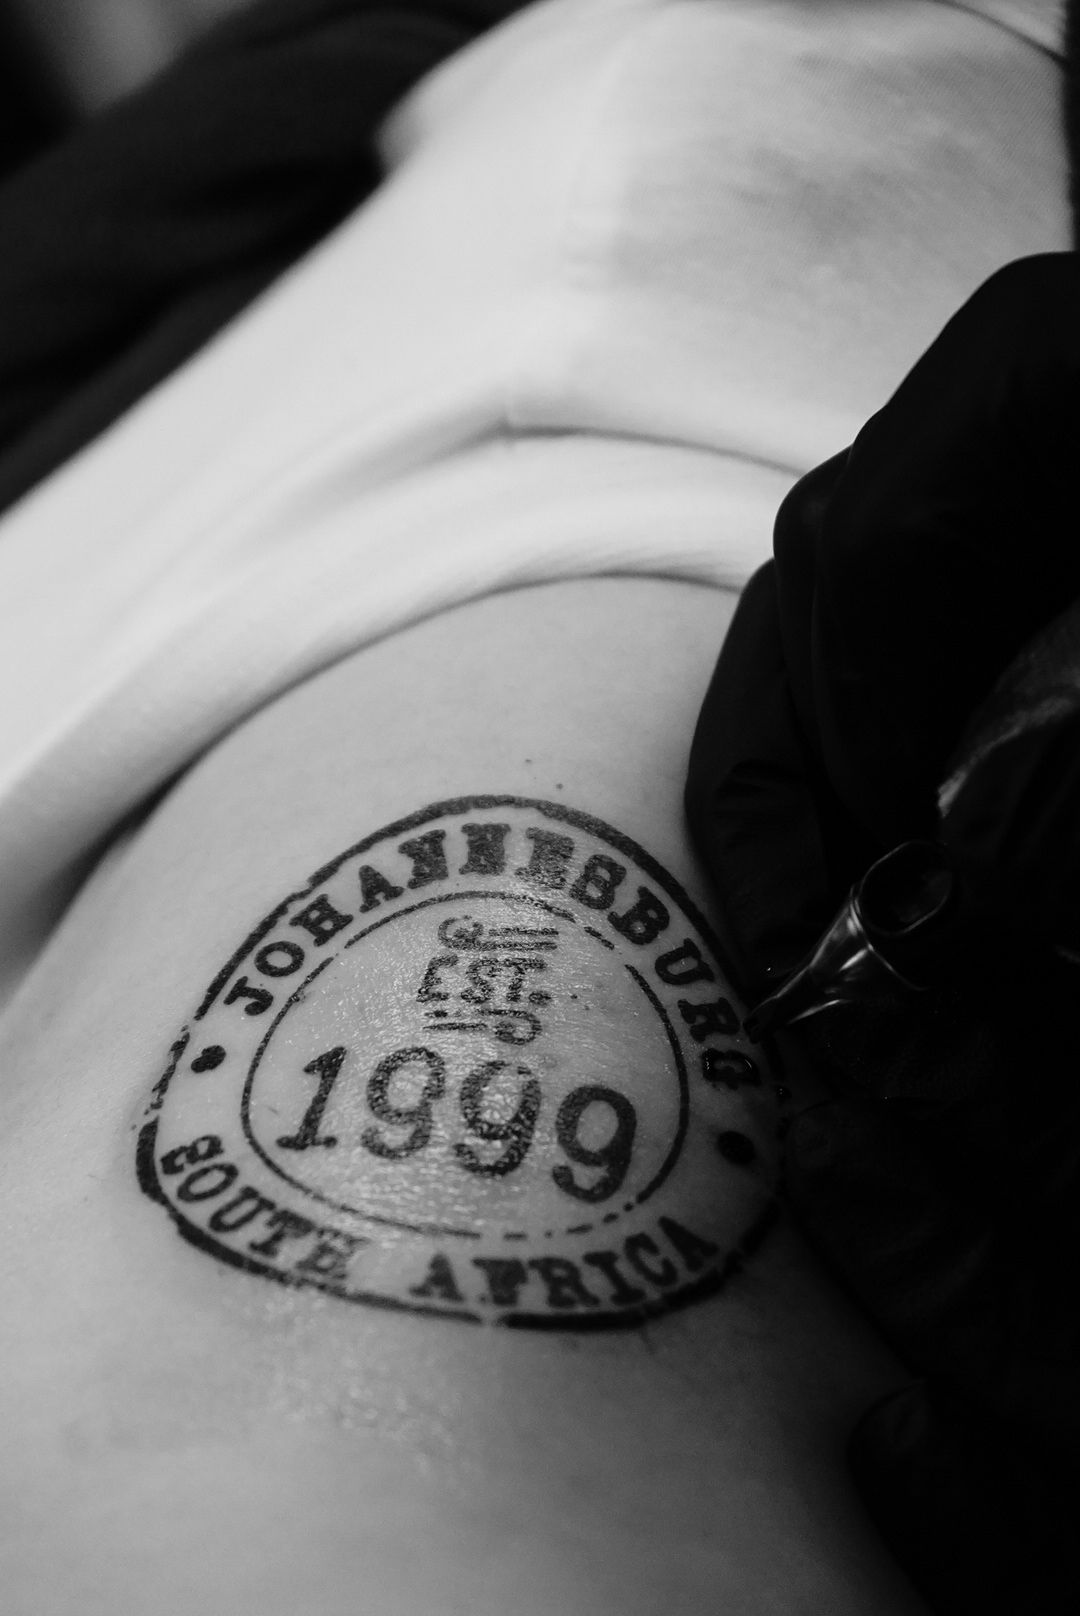 1999 johannesburg south africa birth year stamp tattoo